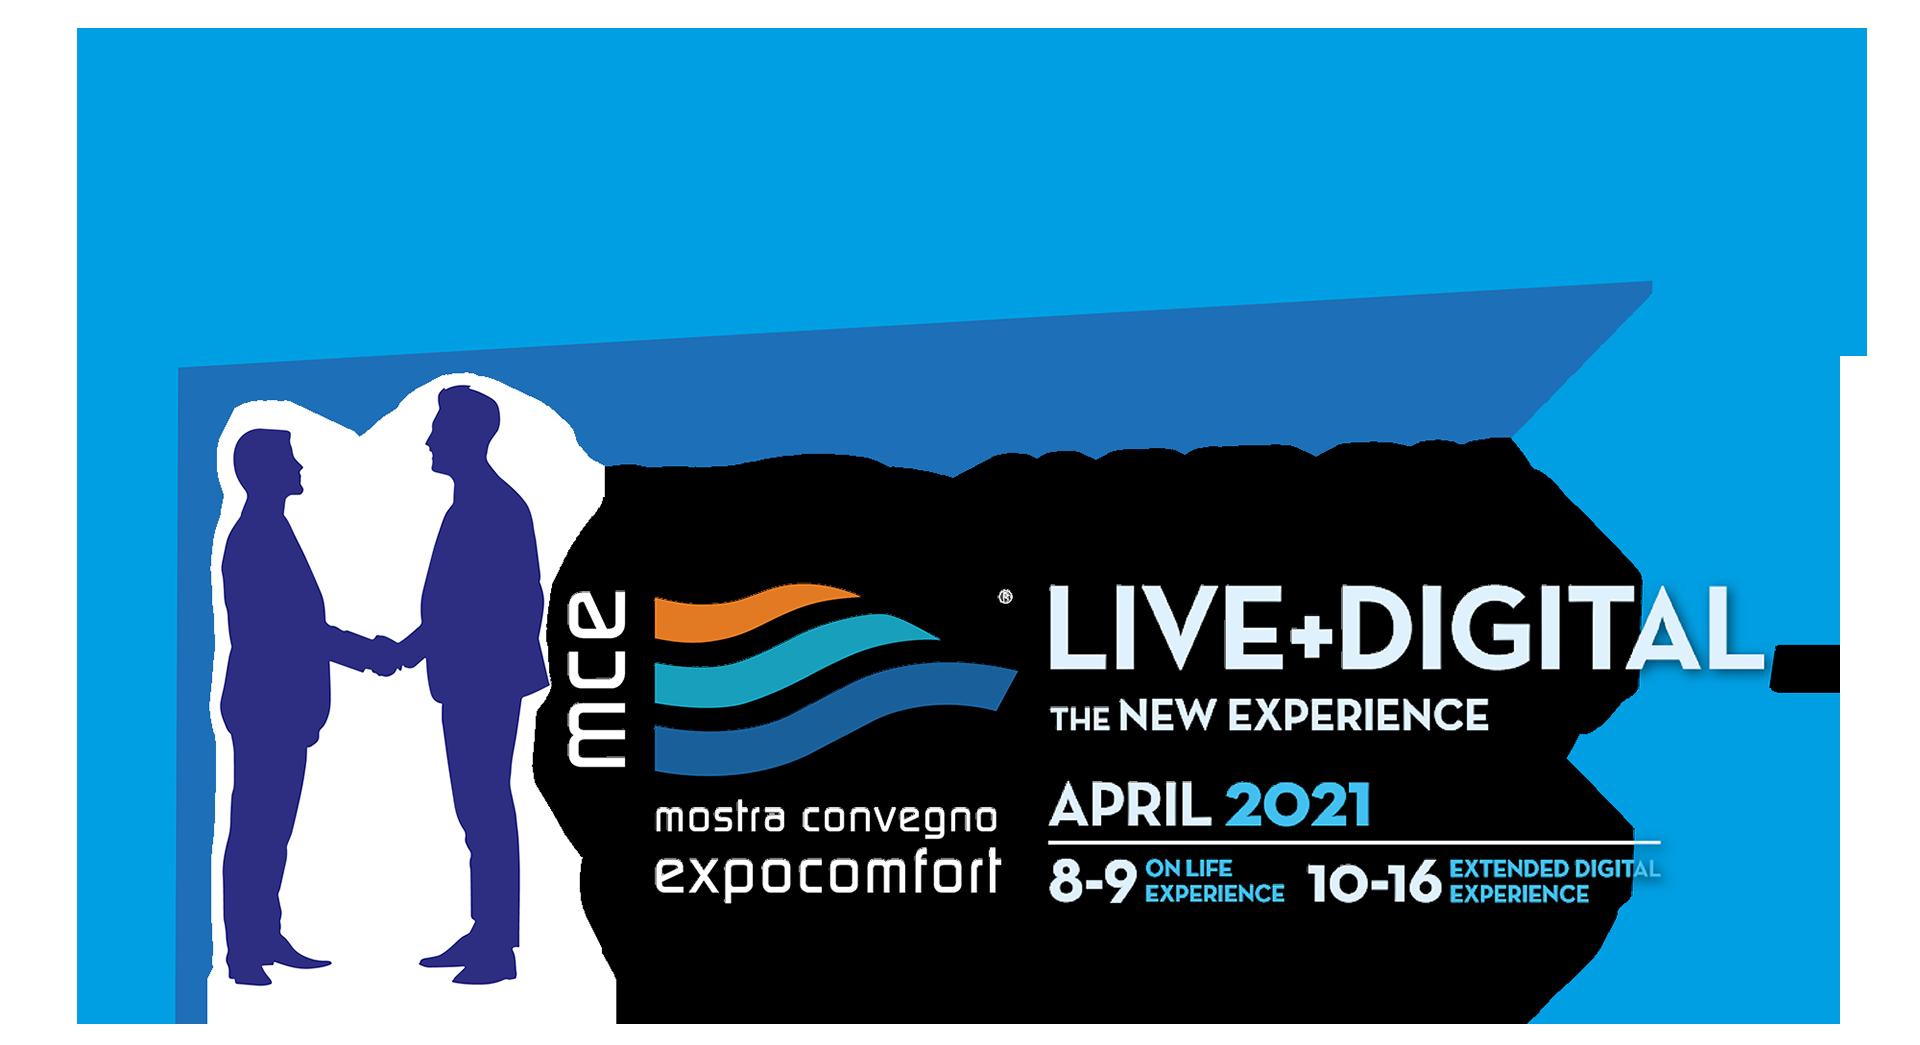 MCE 2021 Live + Digital